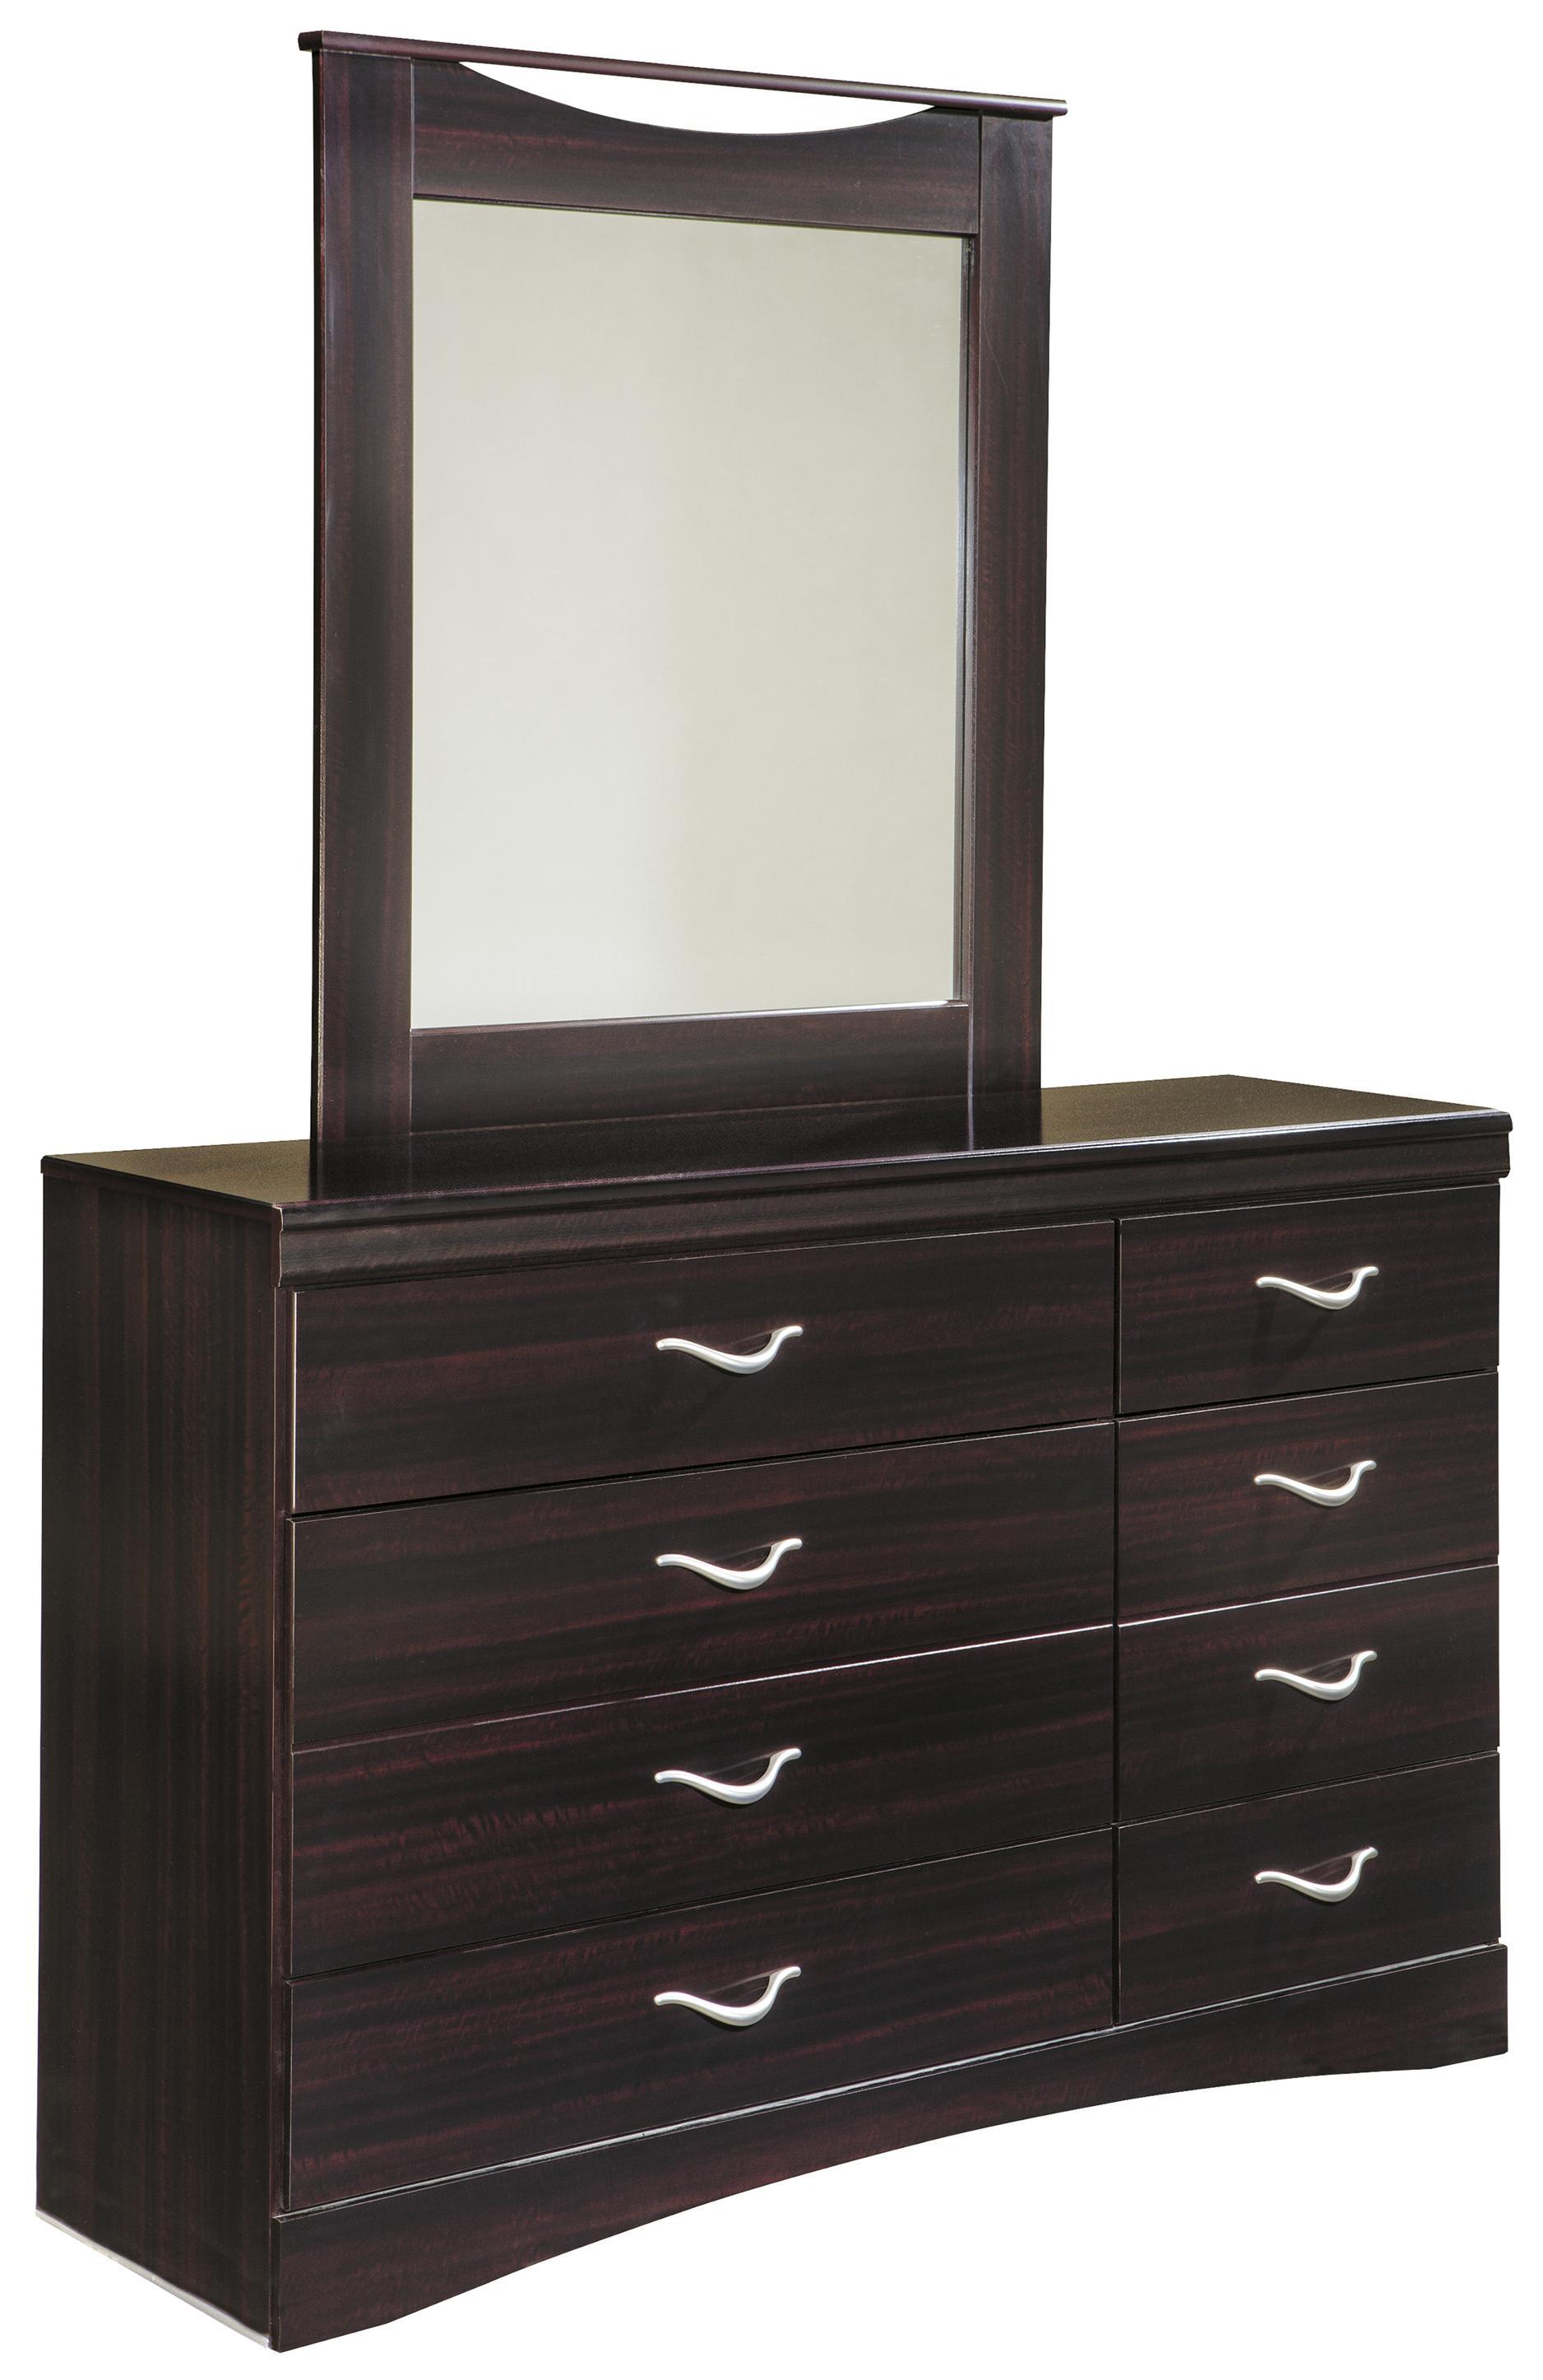 Signature Design by Ashley Zanbury Dresser & Mirror - Item Number: B217-31+36